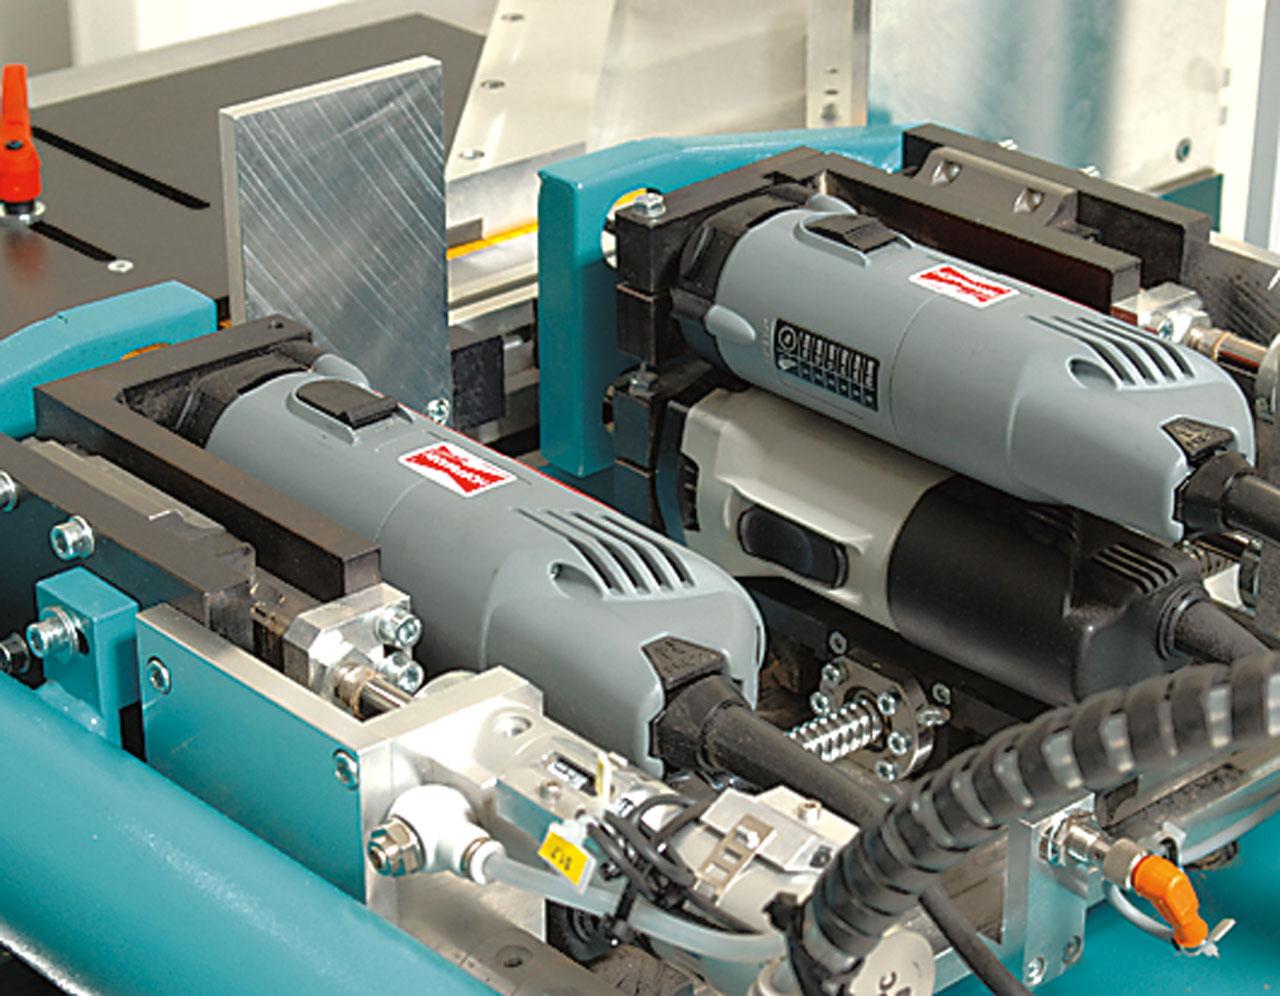 pp2nc-motor-detail-rear-hoffmann-dovetail-routing-machine-w1087010.jpg